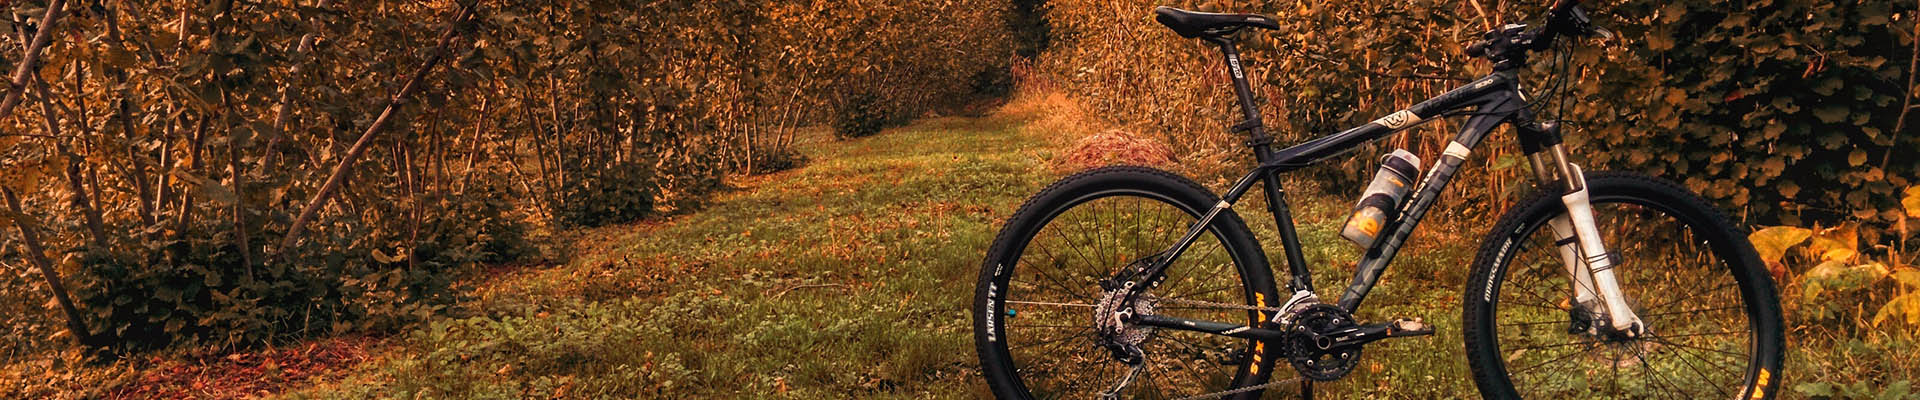 Radfahren botenwirt hinterthal - Botenwirt hinterthal ...